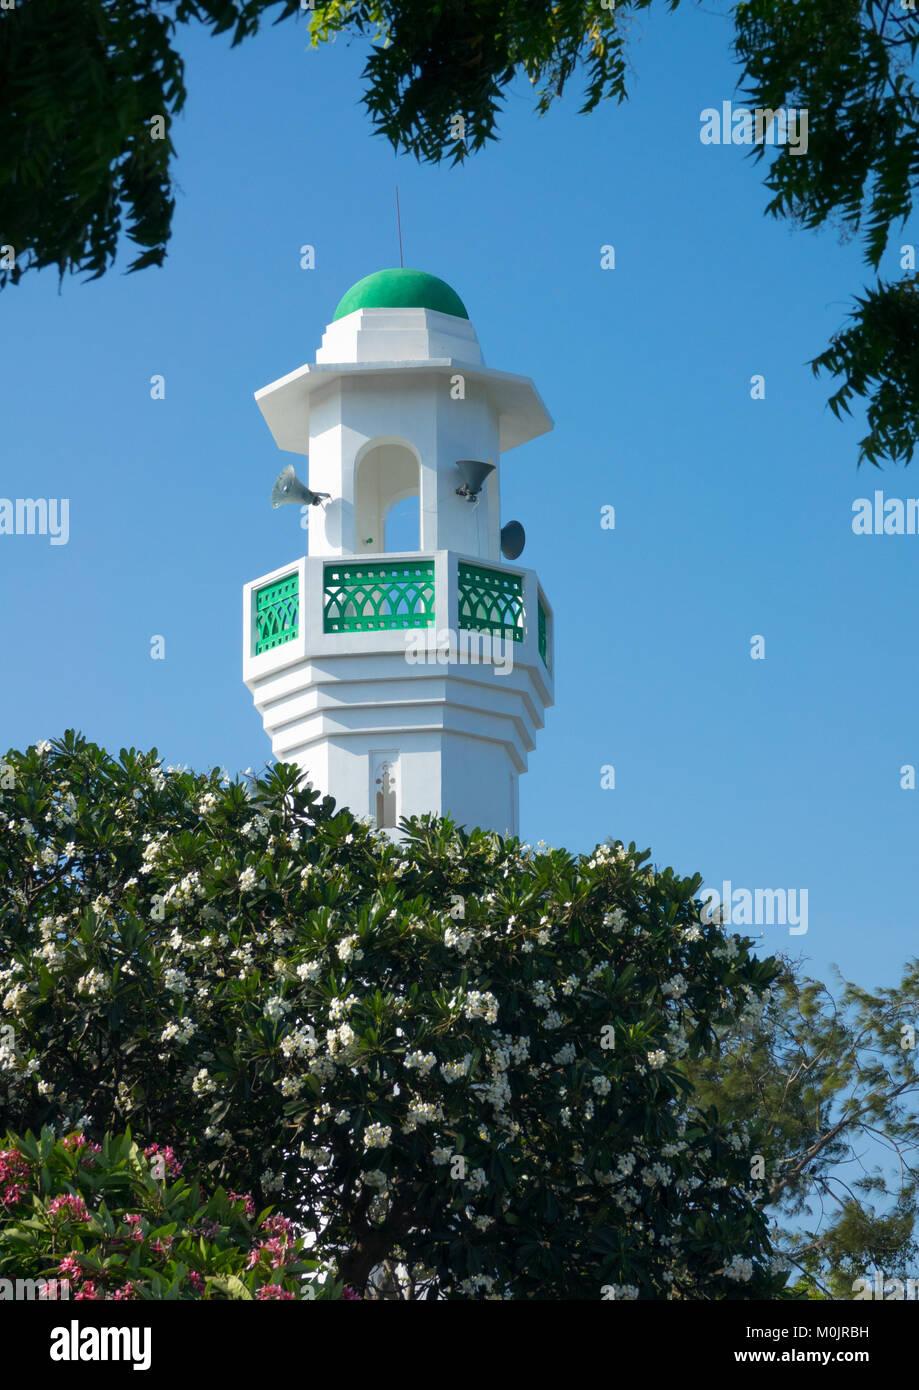 Minaret of the new mosque, Masjid Rawdha, Lamu island, Kenya Stock Photo